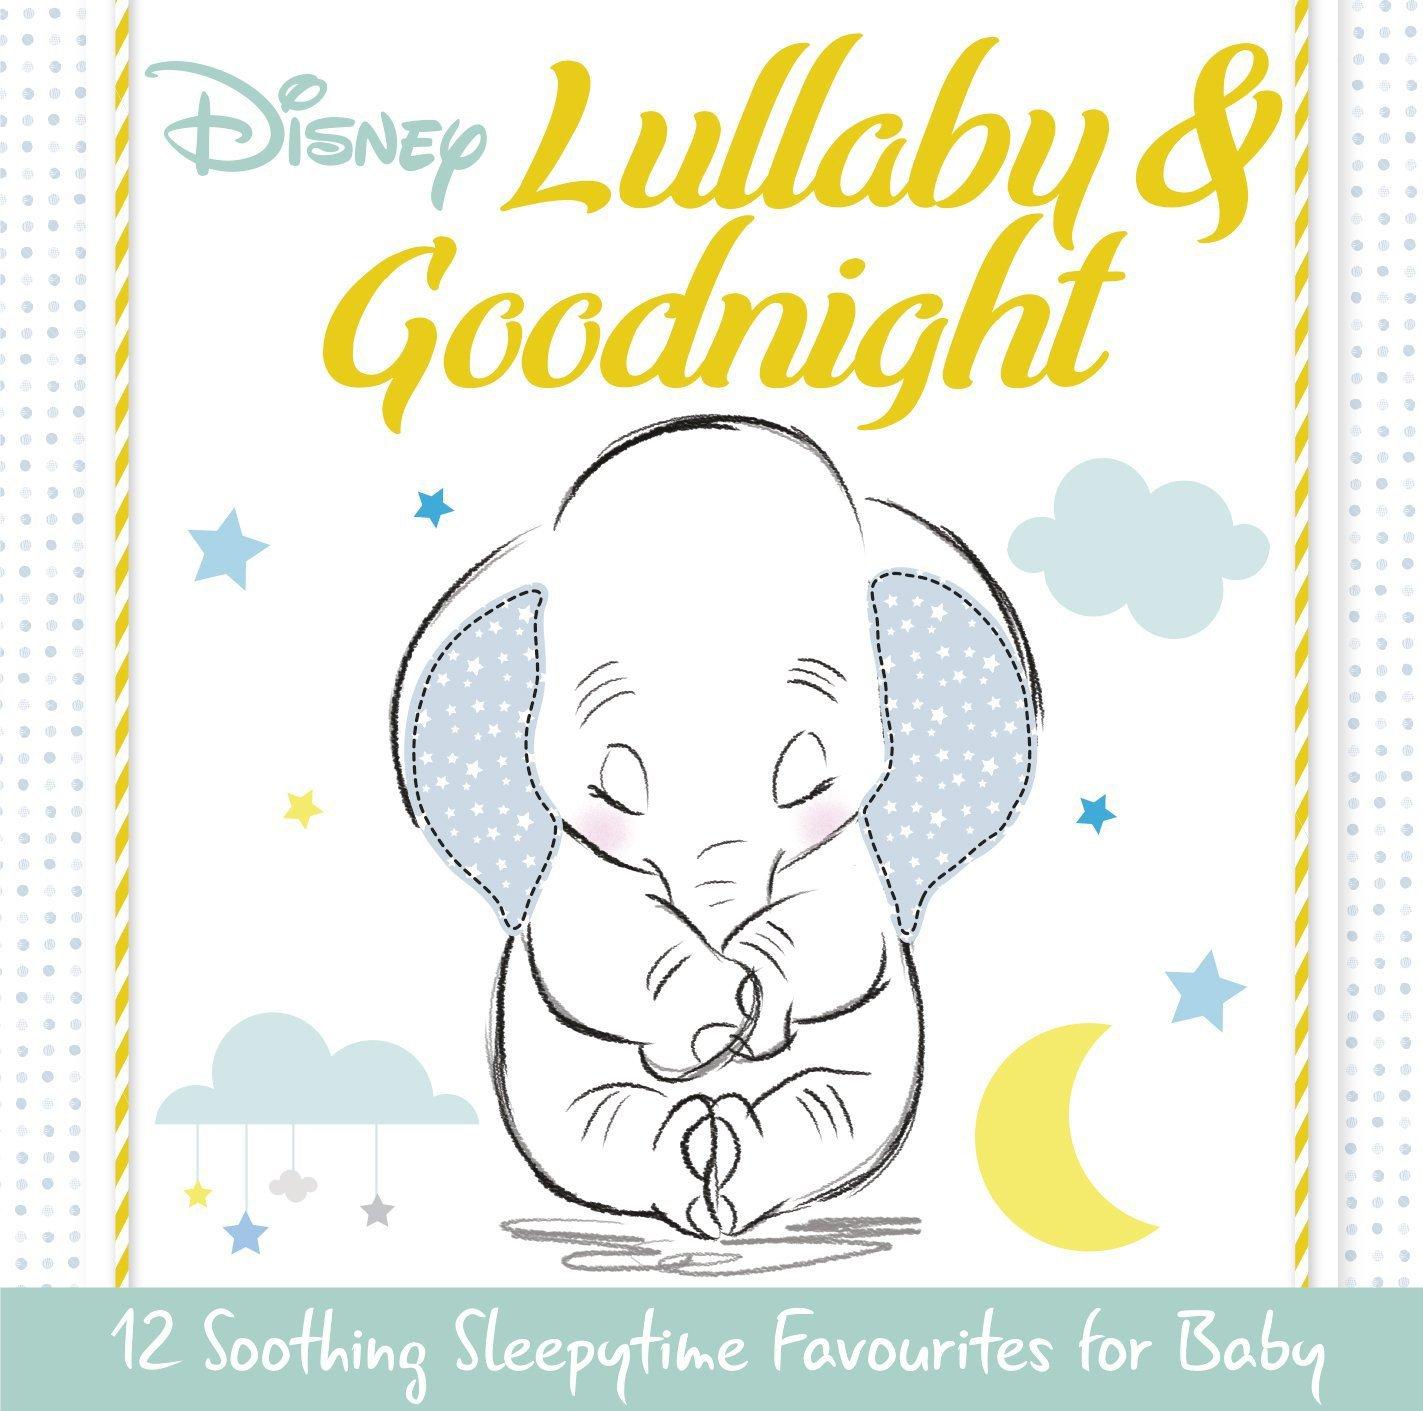 Fred Mollin - Disney Lullaby & Goodnight / Mollin, Fred - Amazon.com Music